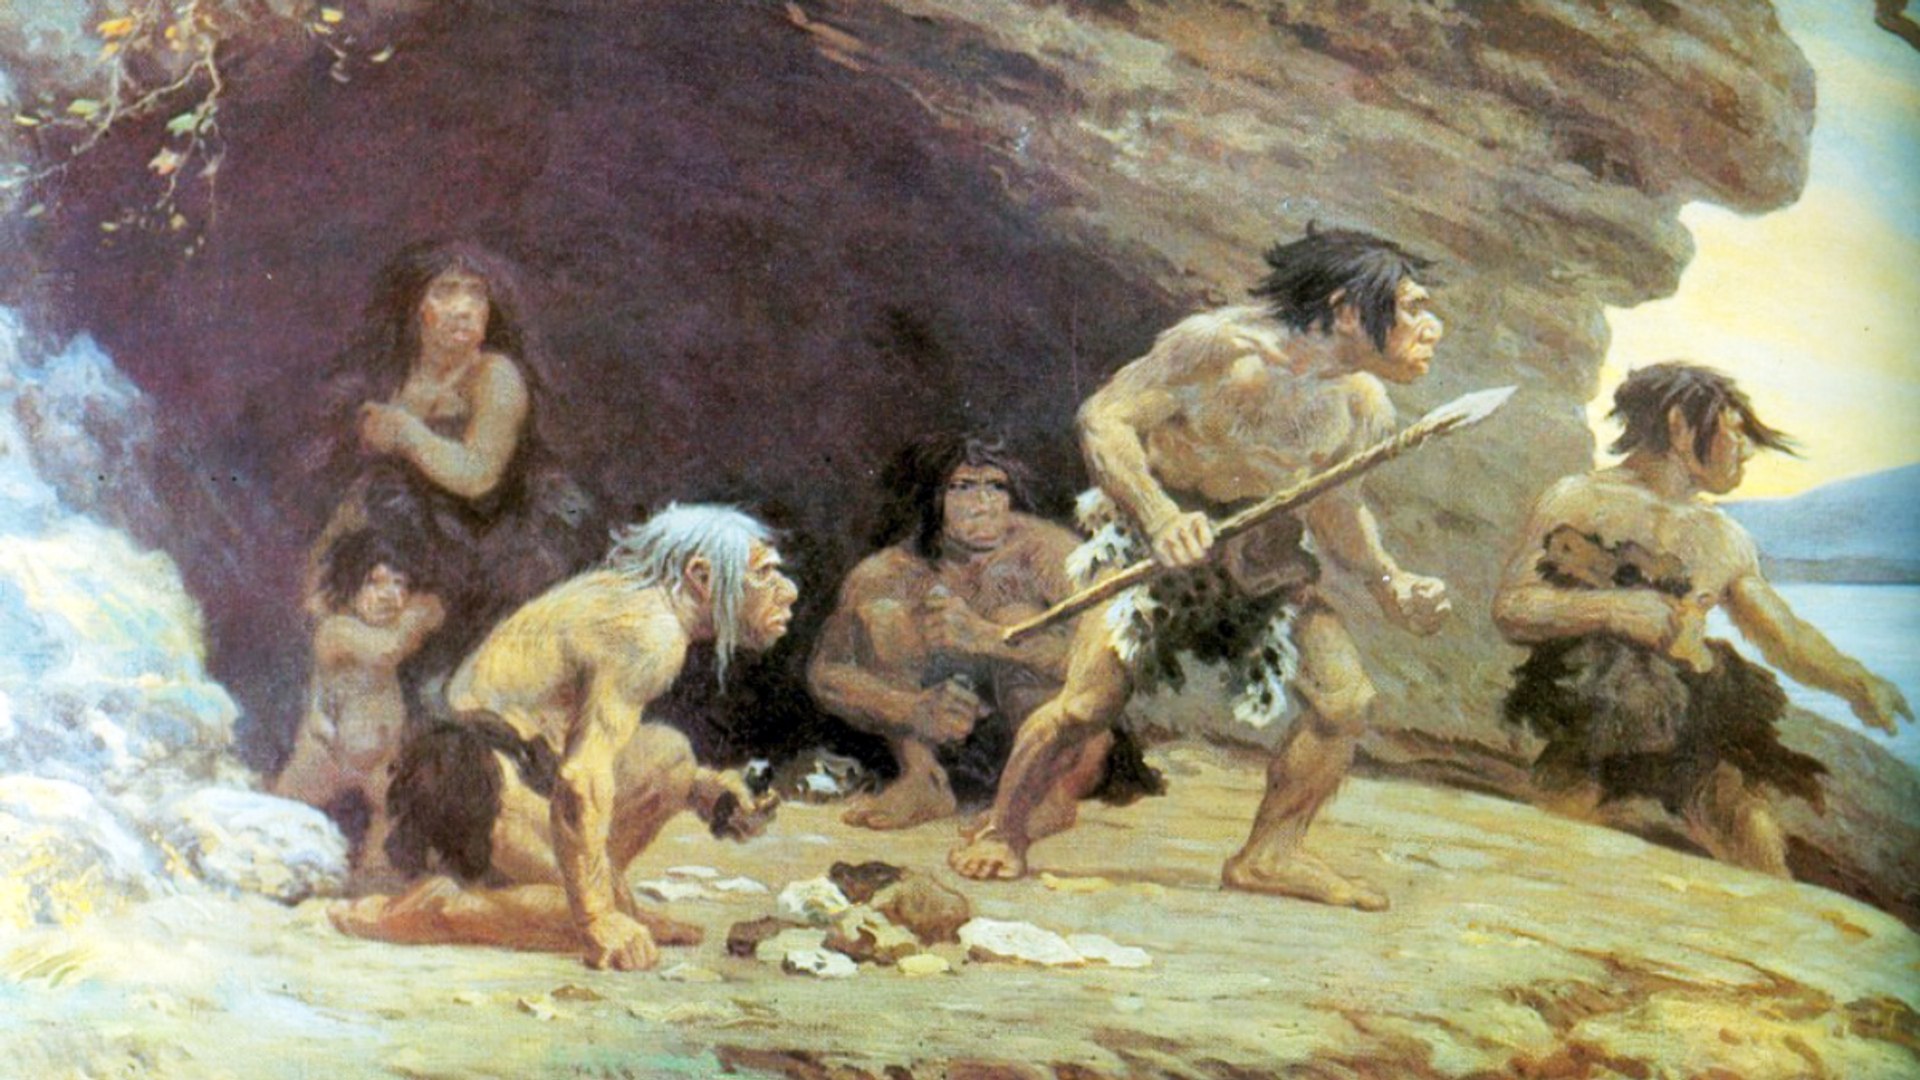 Los neandertales, imagen ilustrativa - Sputnik Mundo, 1920, 12.02.2021